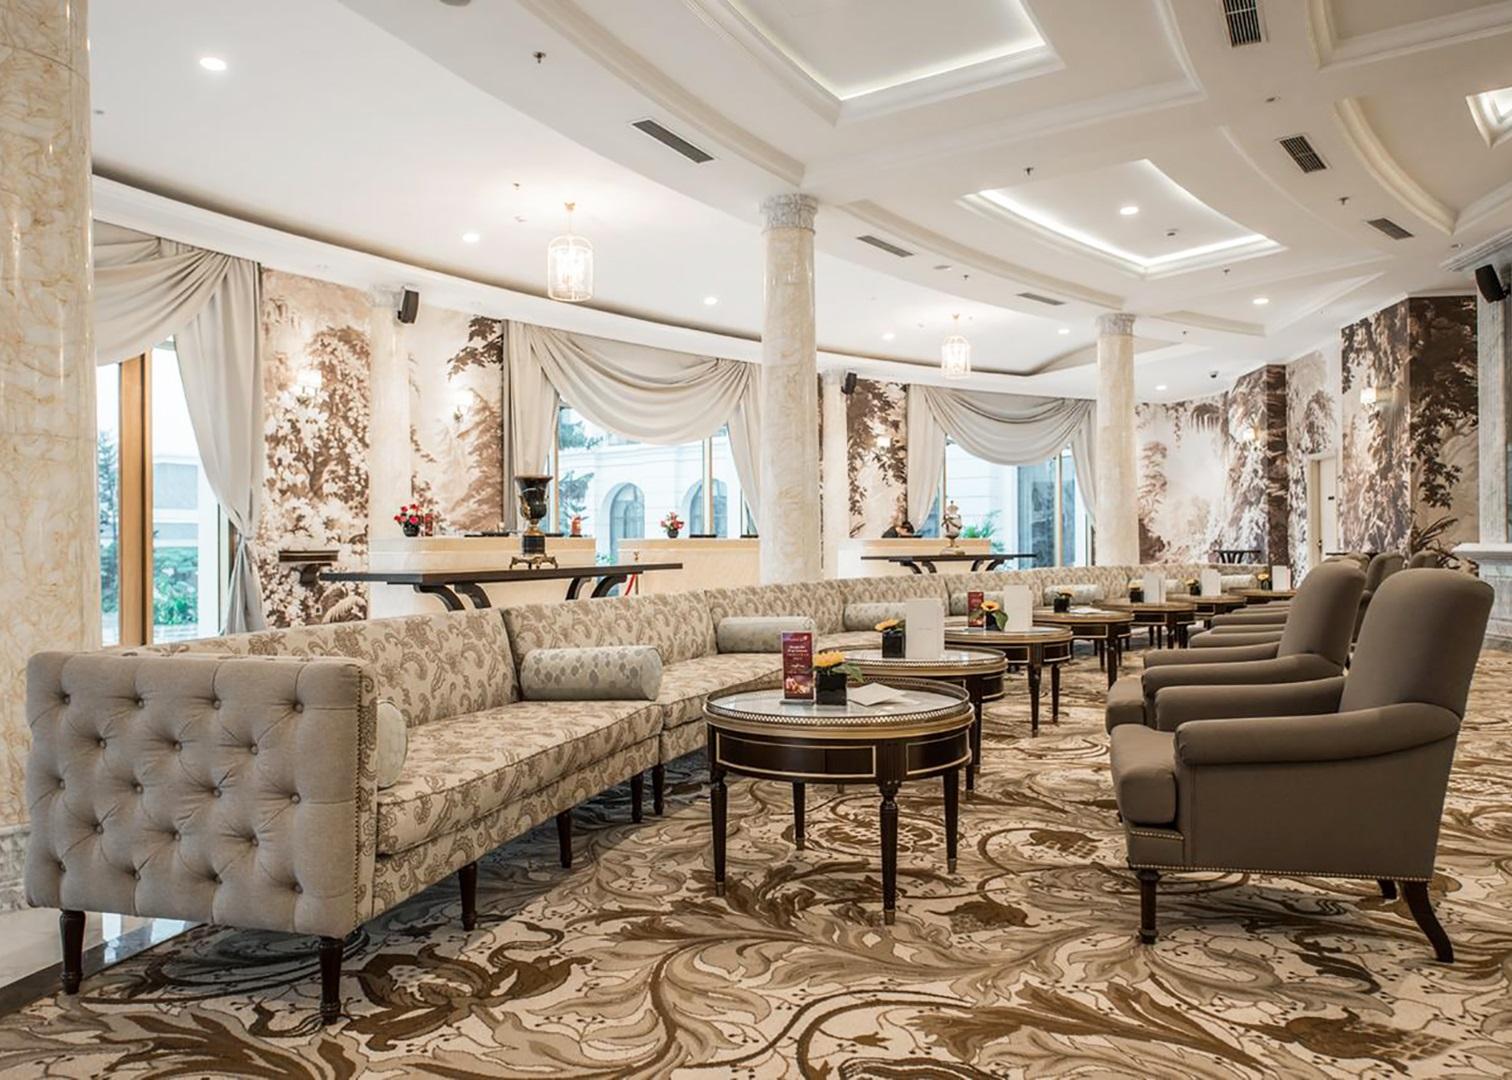 Фотография отеля Vinpearl Resort & Spa Ha Long 5*